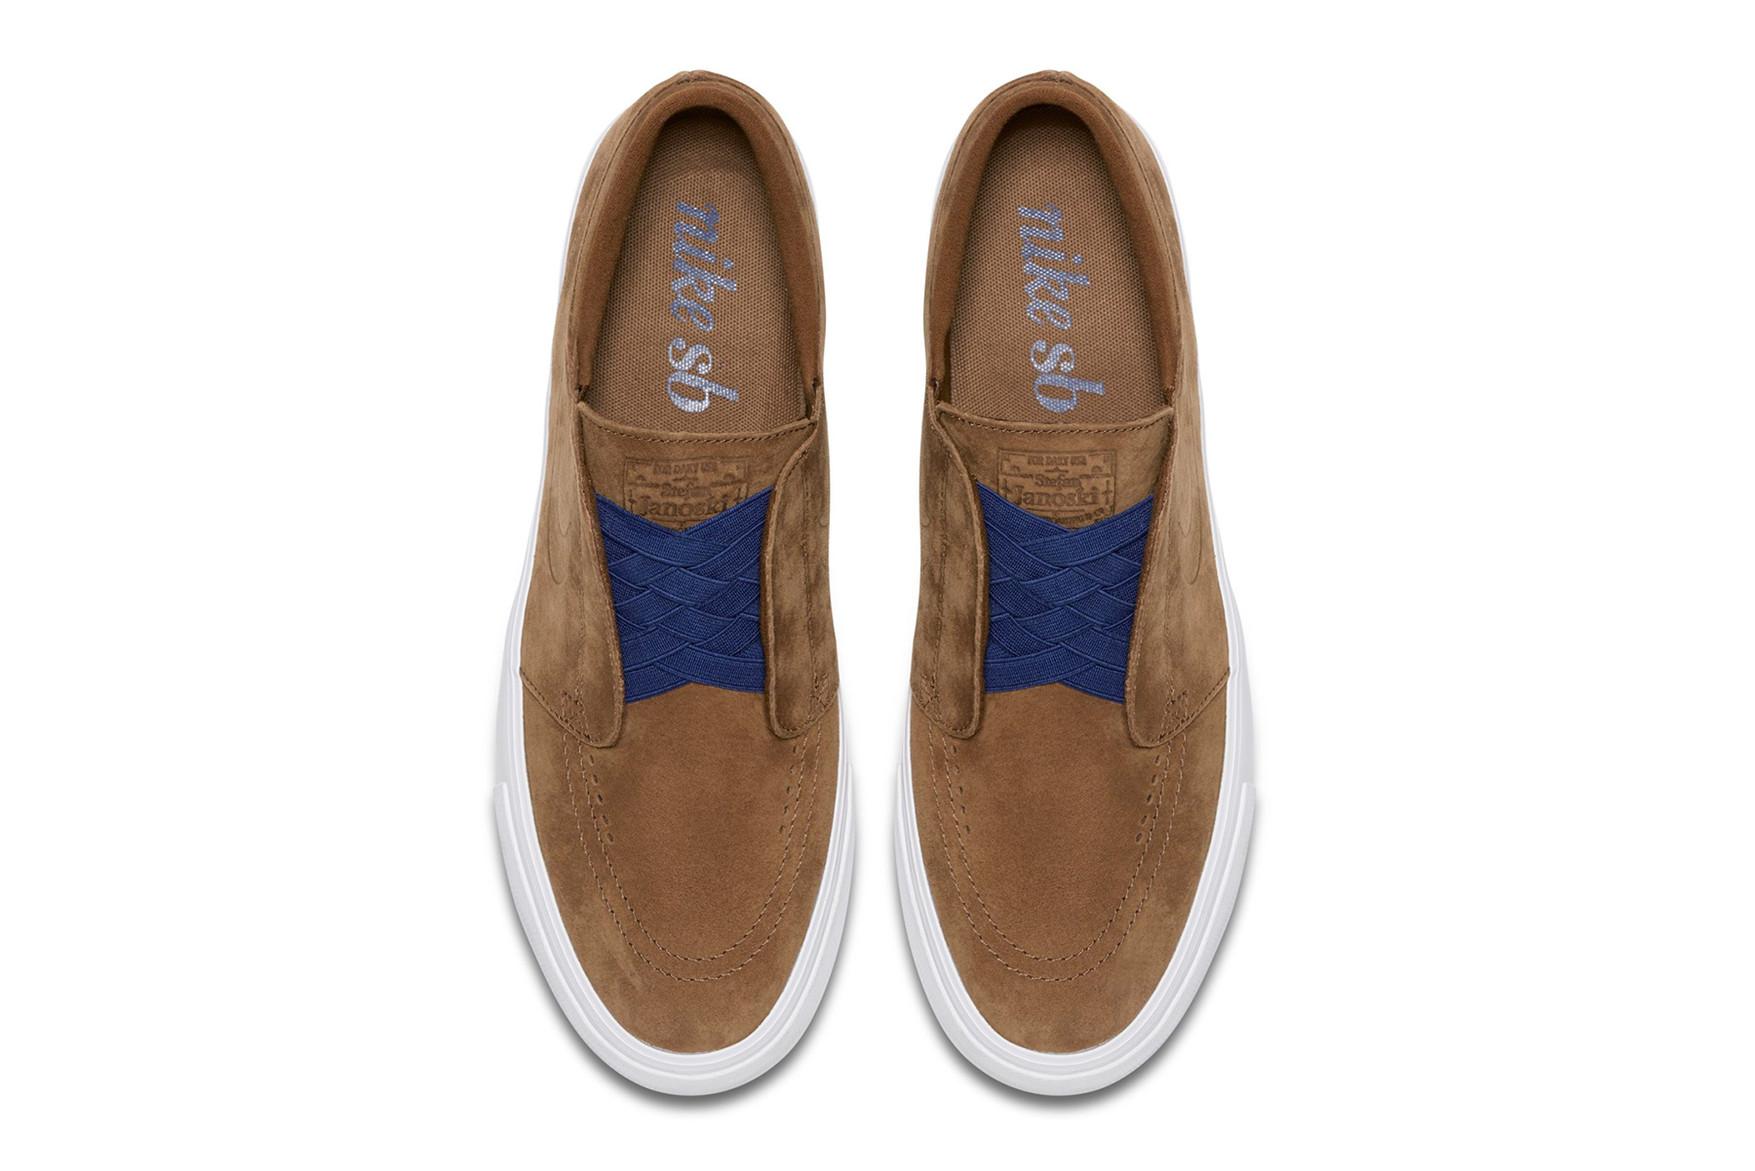 Nike SB Zoom Janoski HT Slip-On British